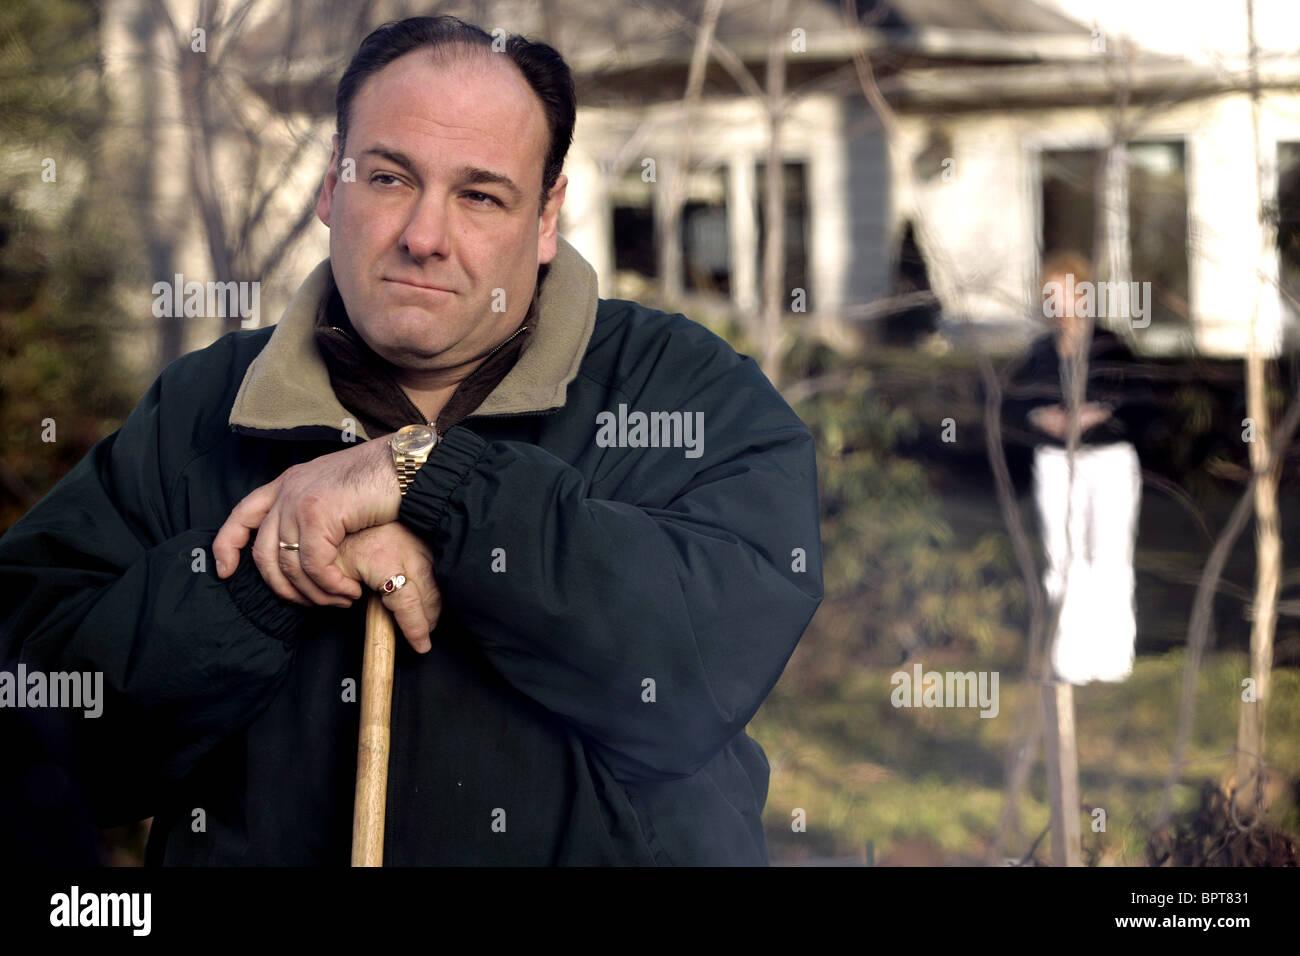 The Sopranos Stock Photos & The Sopranos Stock Images - Alamy